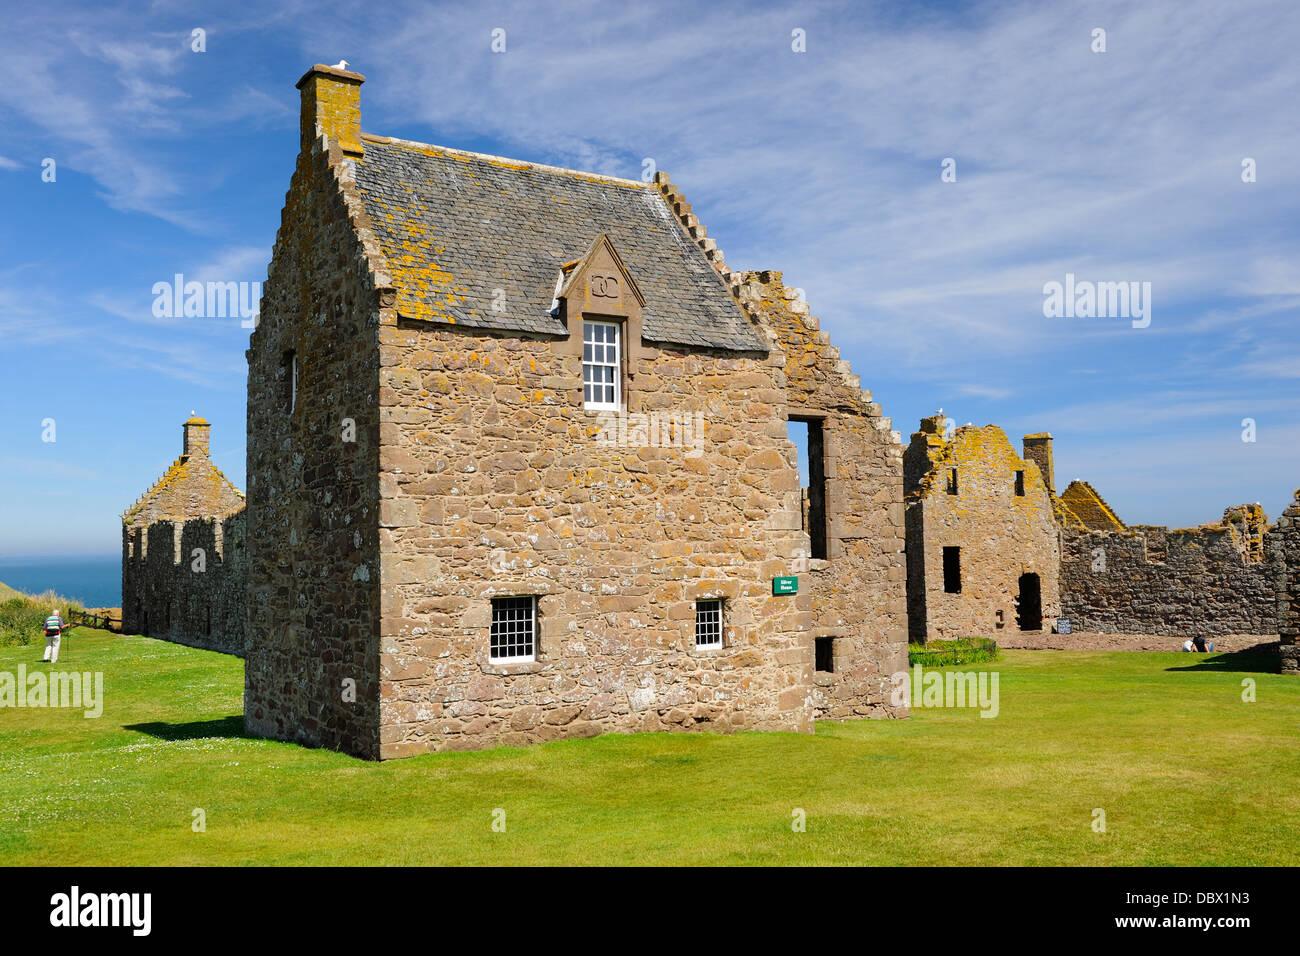 Dunnottar Castle near Stonehaven, Aberdeenshire, Scotland - Stock Image